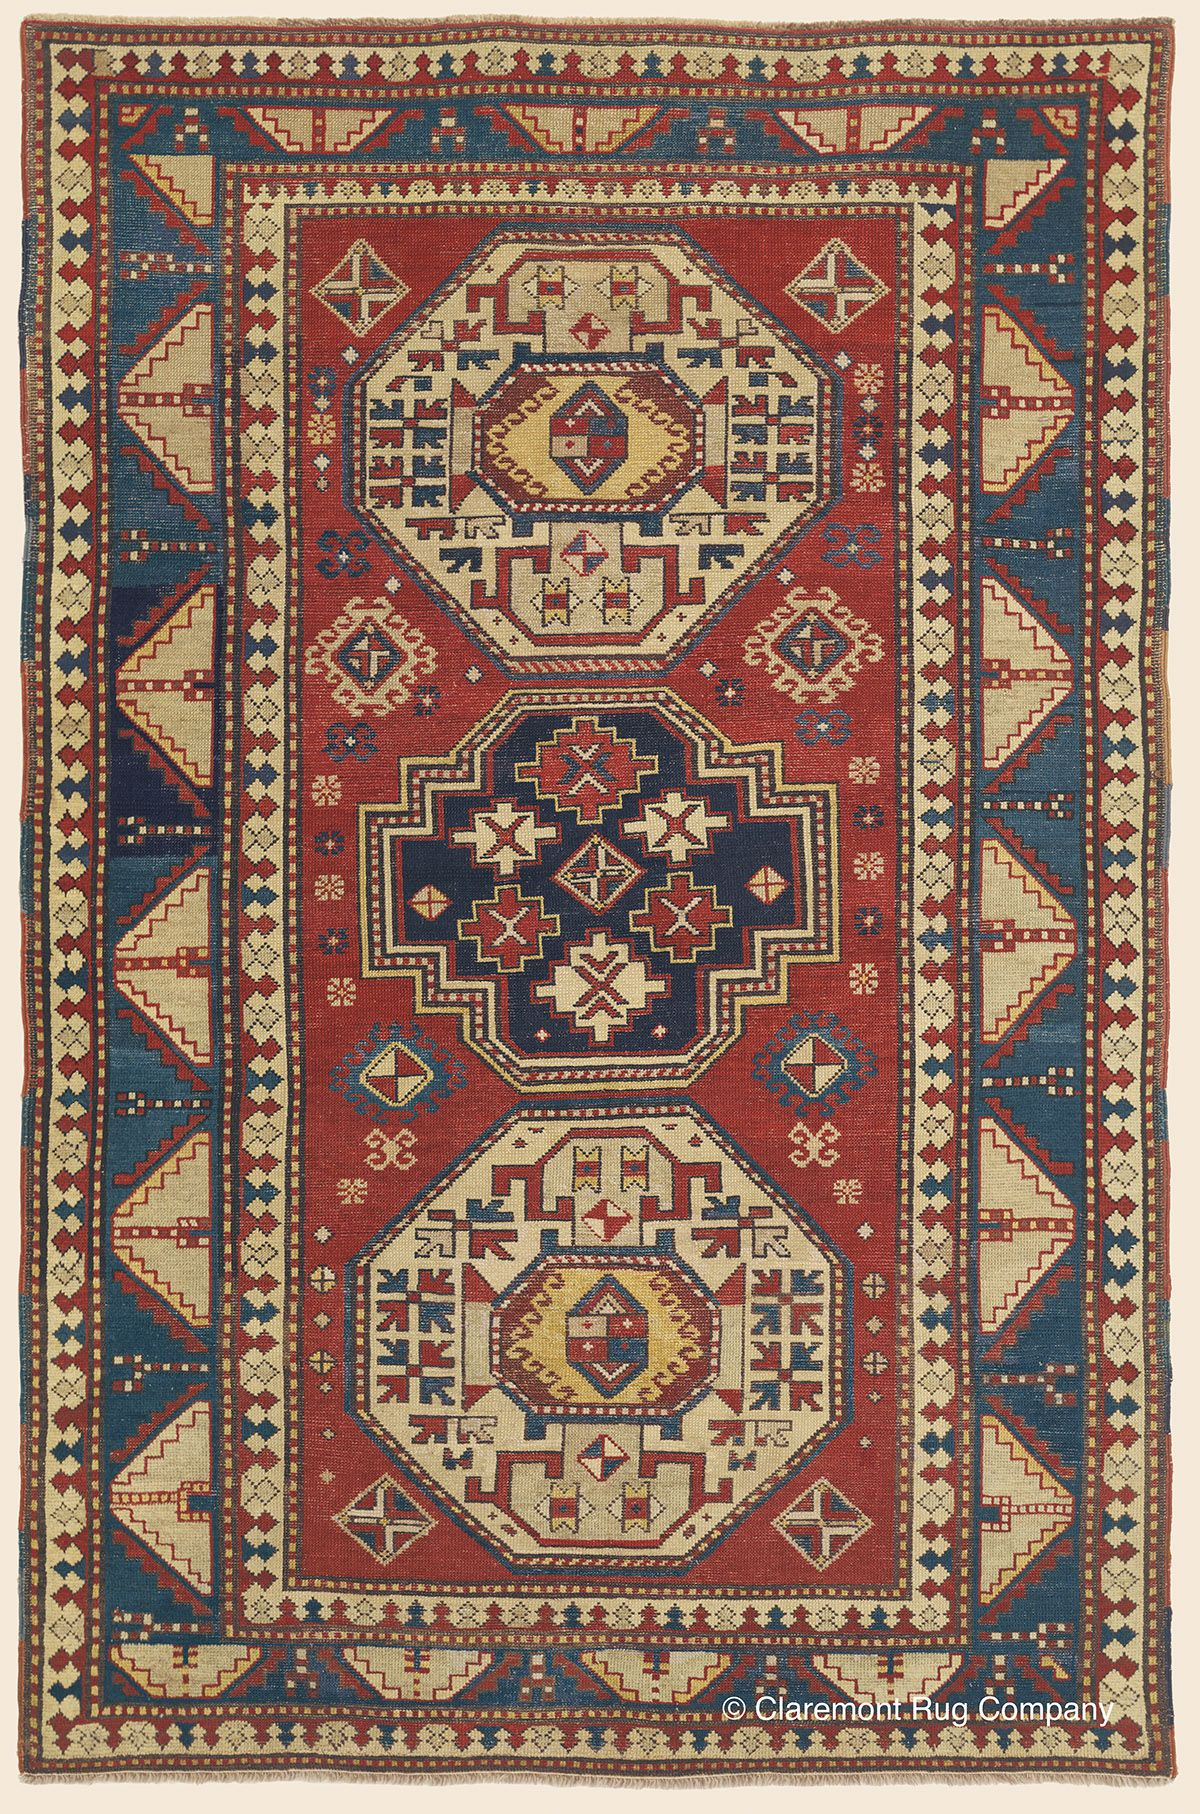 Triple Medallion Kazak Southern Central Caucasia Antique Rug 4 8 X 7 0 Circa 1850 Claremont Rug Company Rugs Persian Carpet Tribal Rug